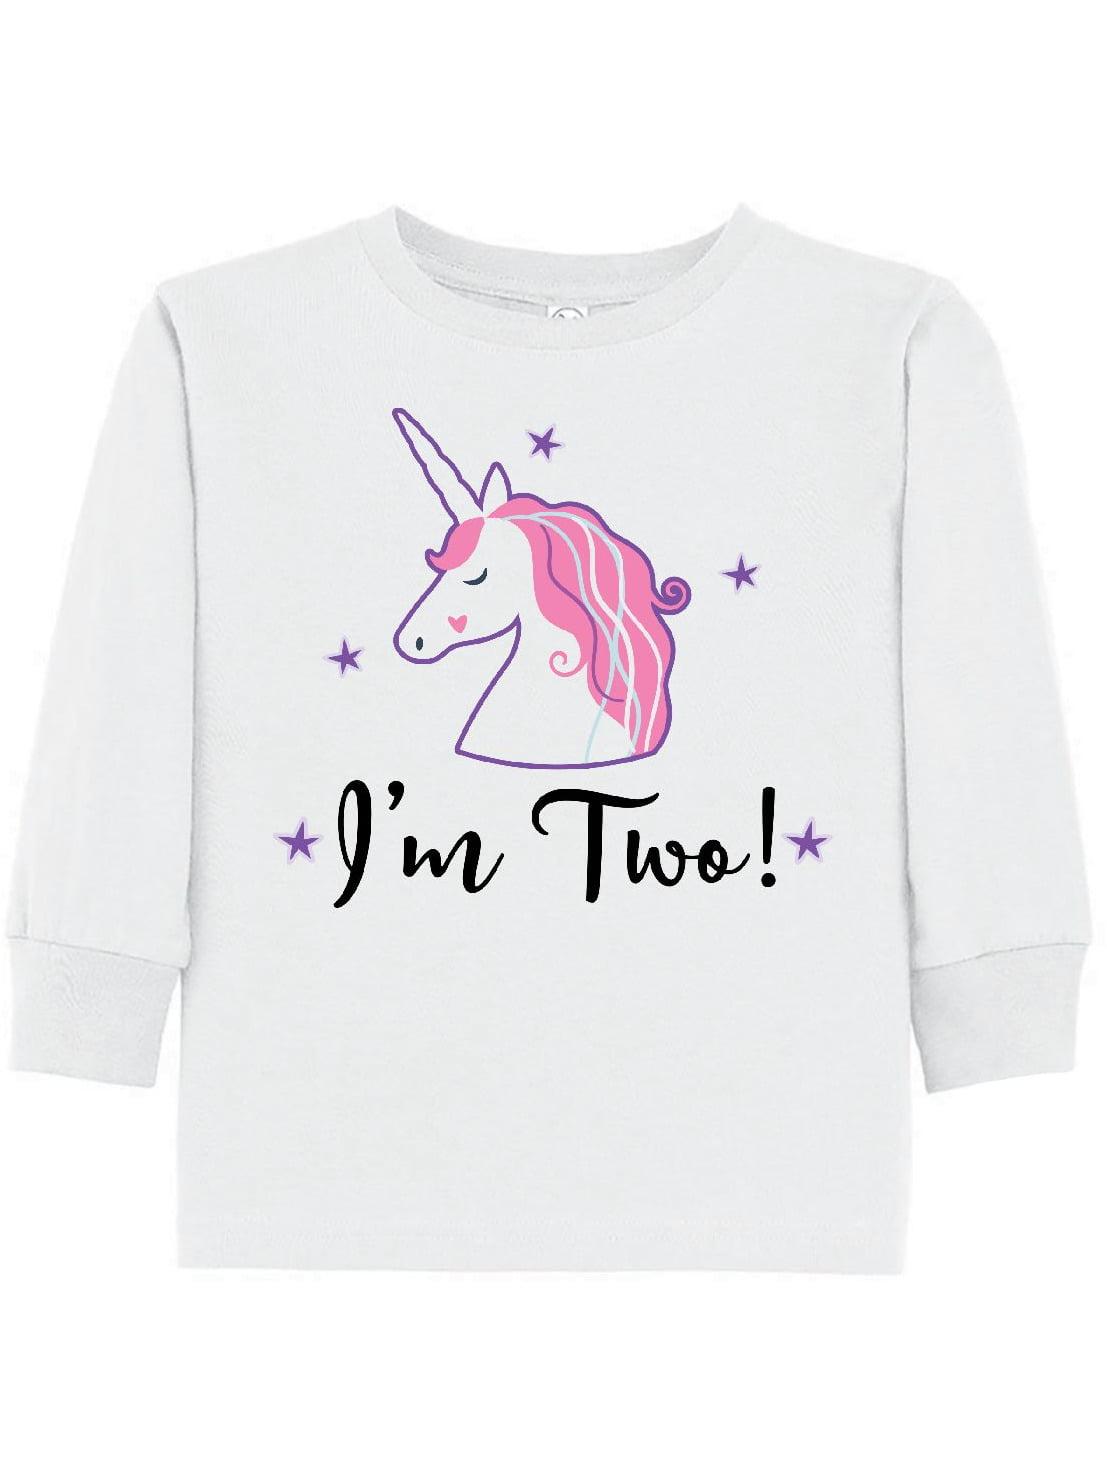 2nd Birthday Unicorn Party Toddler Long Sleeve T-Shirt